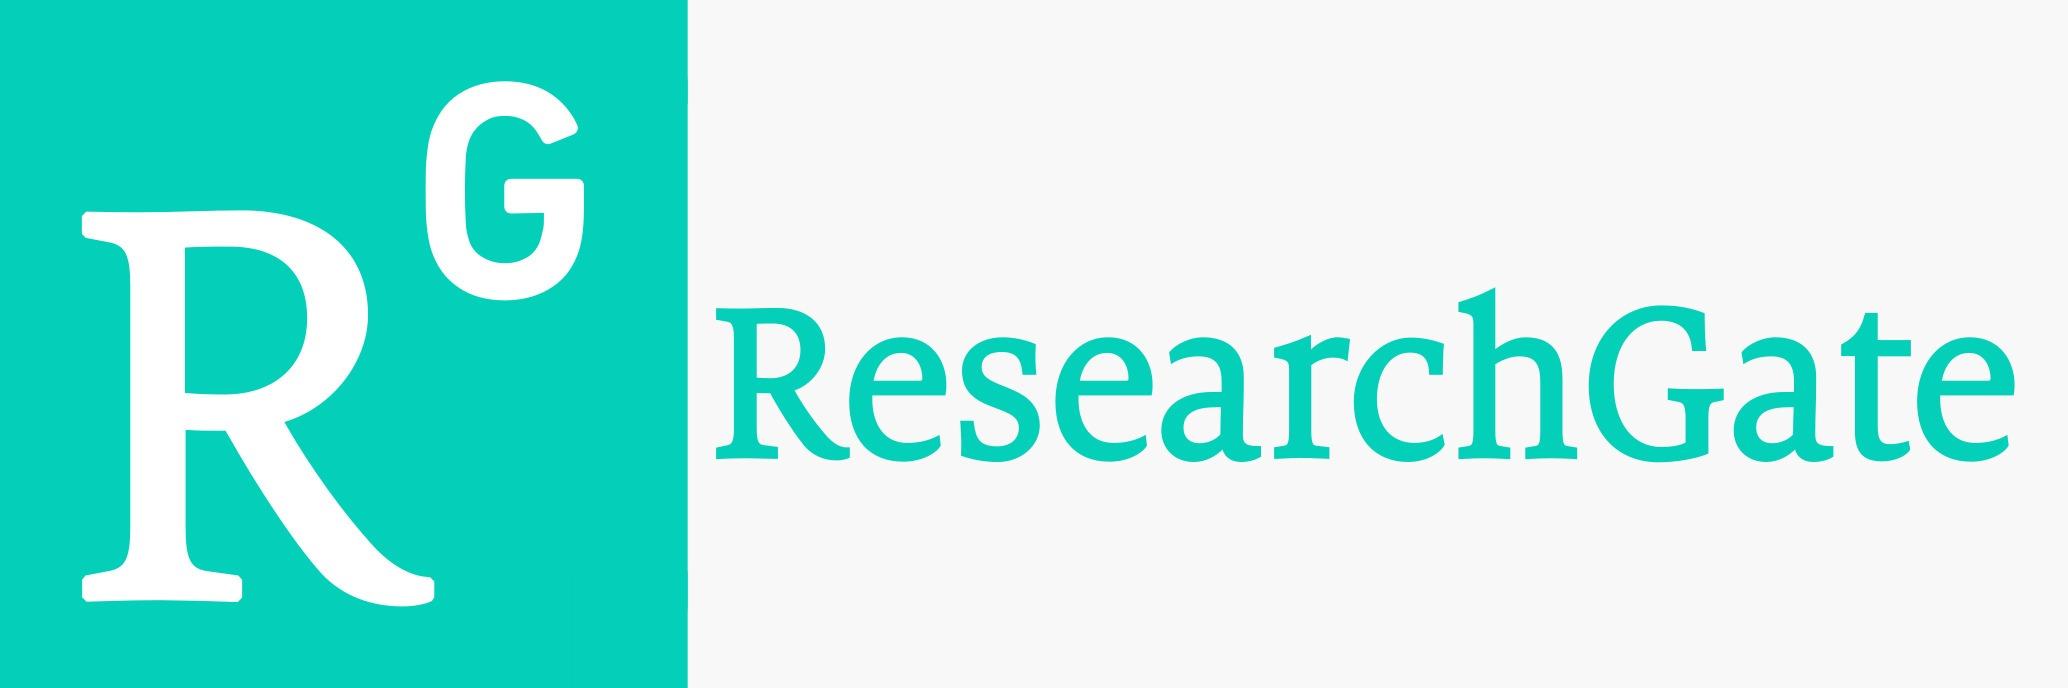 Our Methusalem/Odysseus Programme on ResearchGate